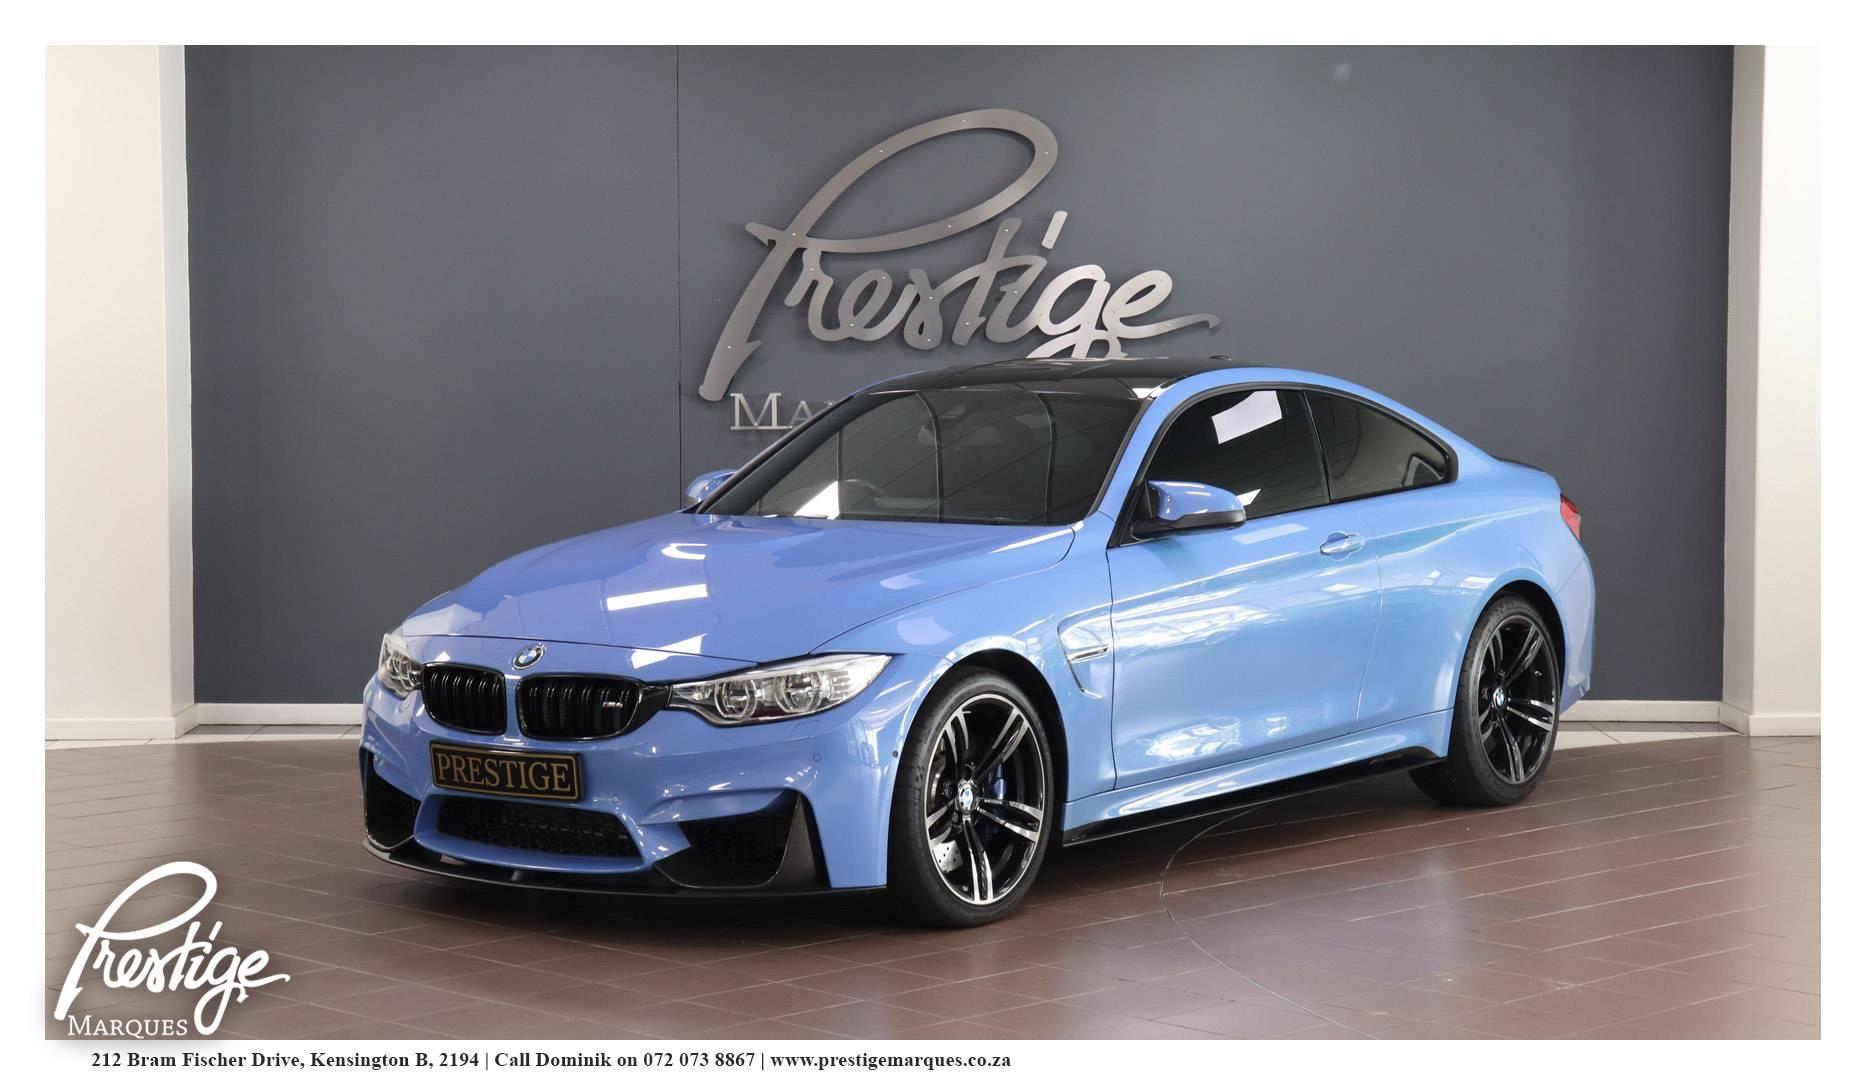 2015-BMW-M4-Coupe-Blue-Prestige-Marques-Randburg-Sandton-8